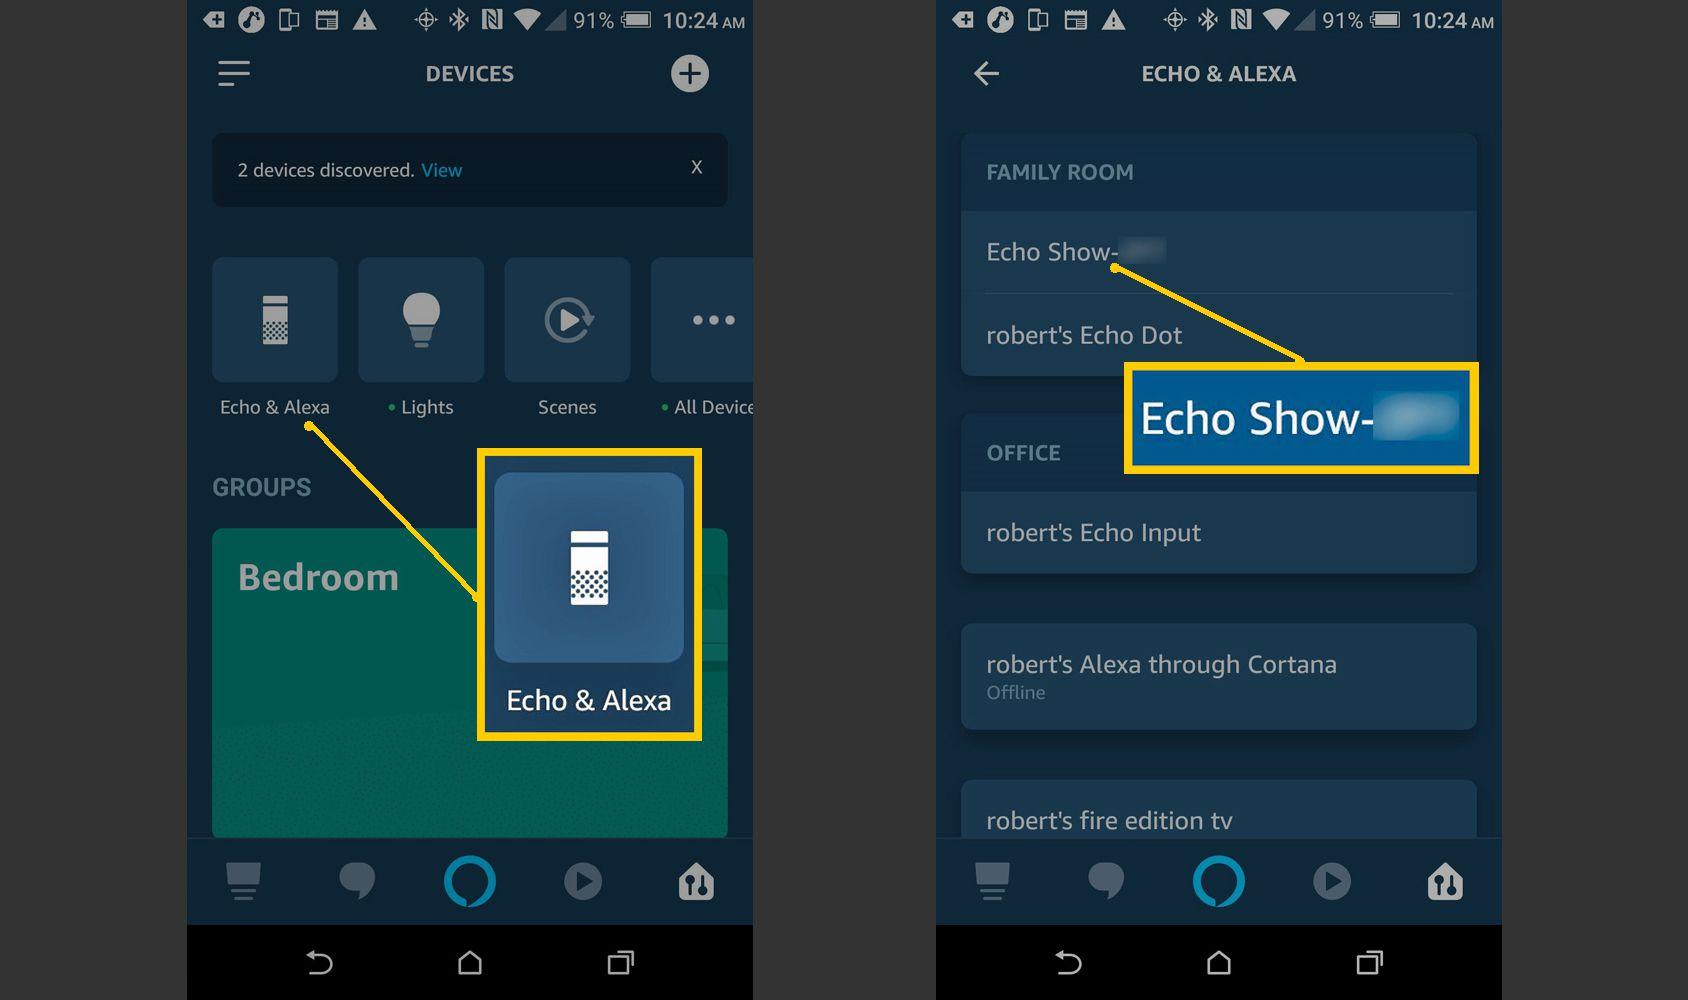 Alexa app – Select Device to Reset